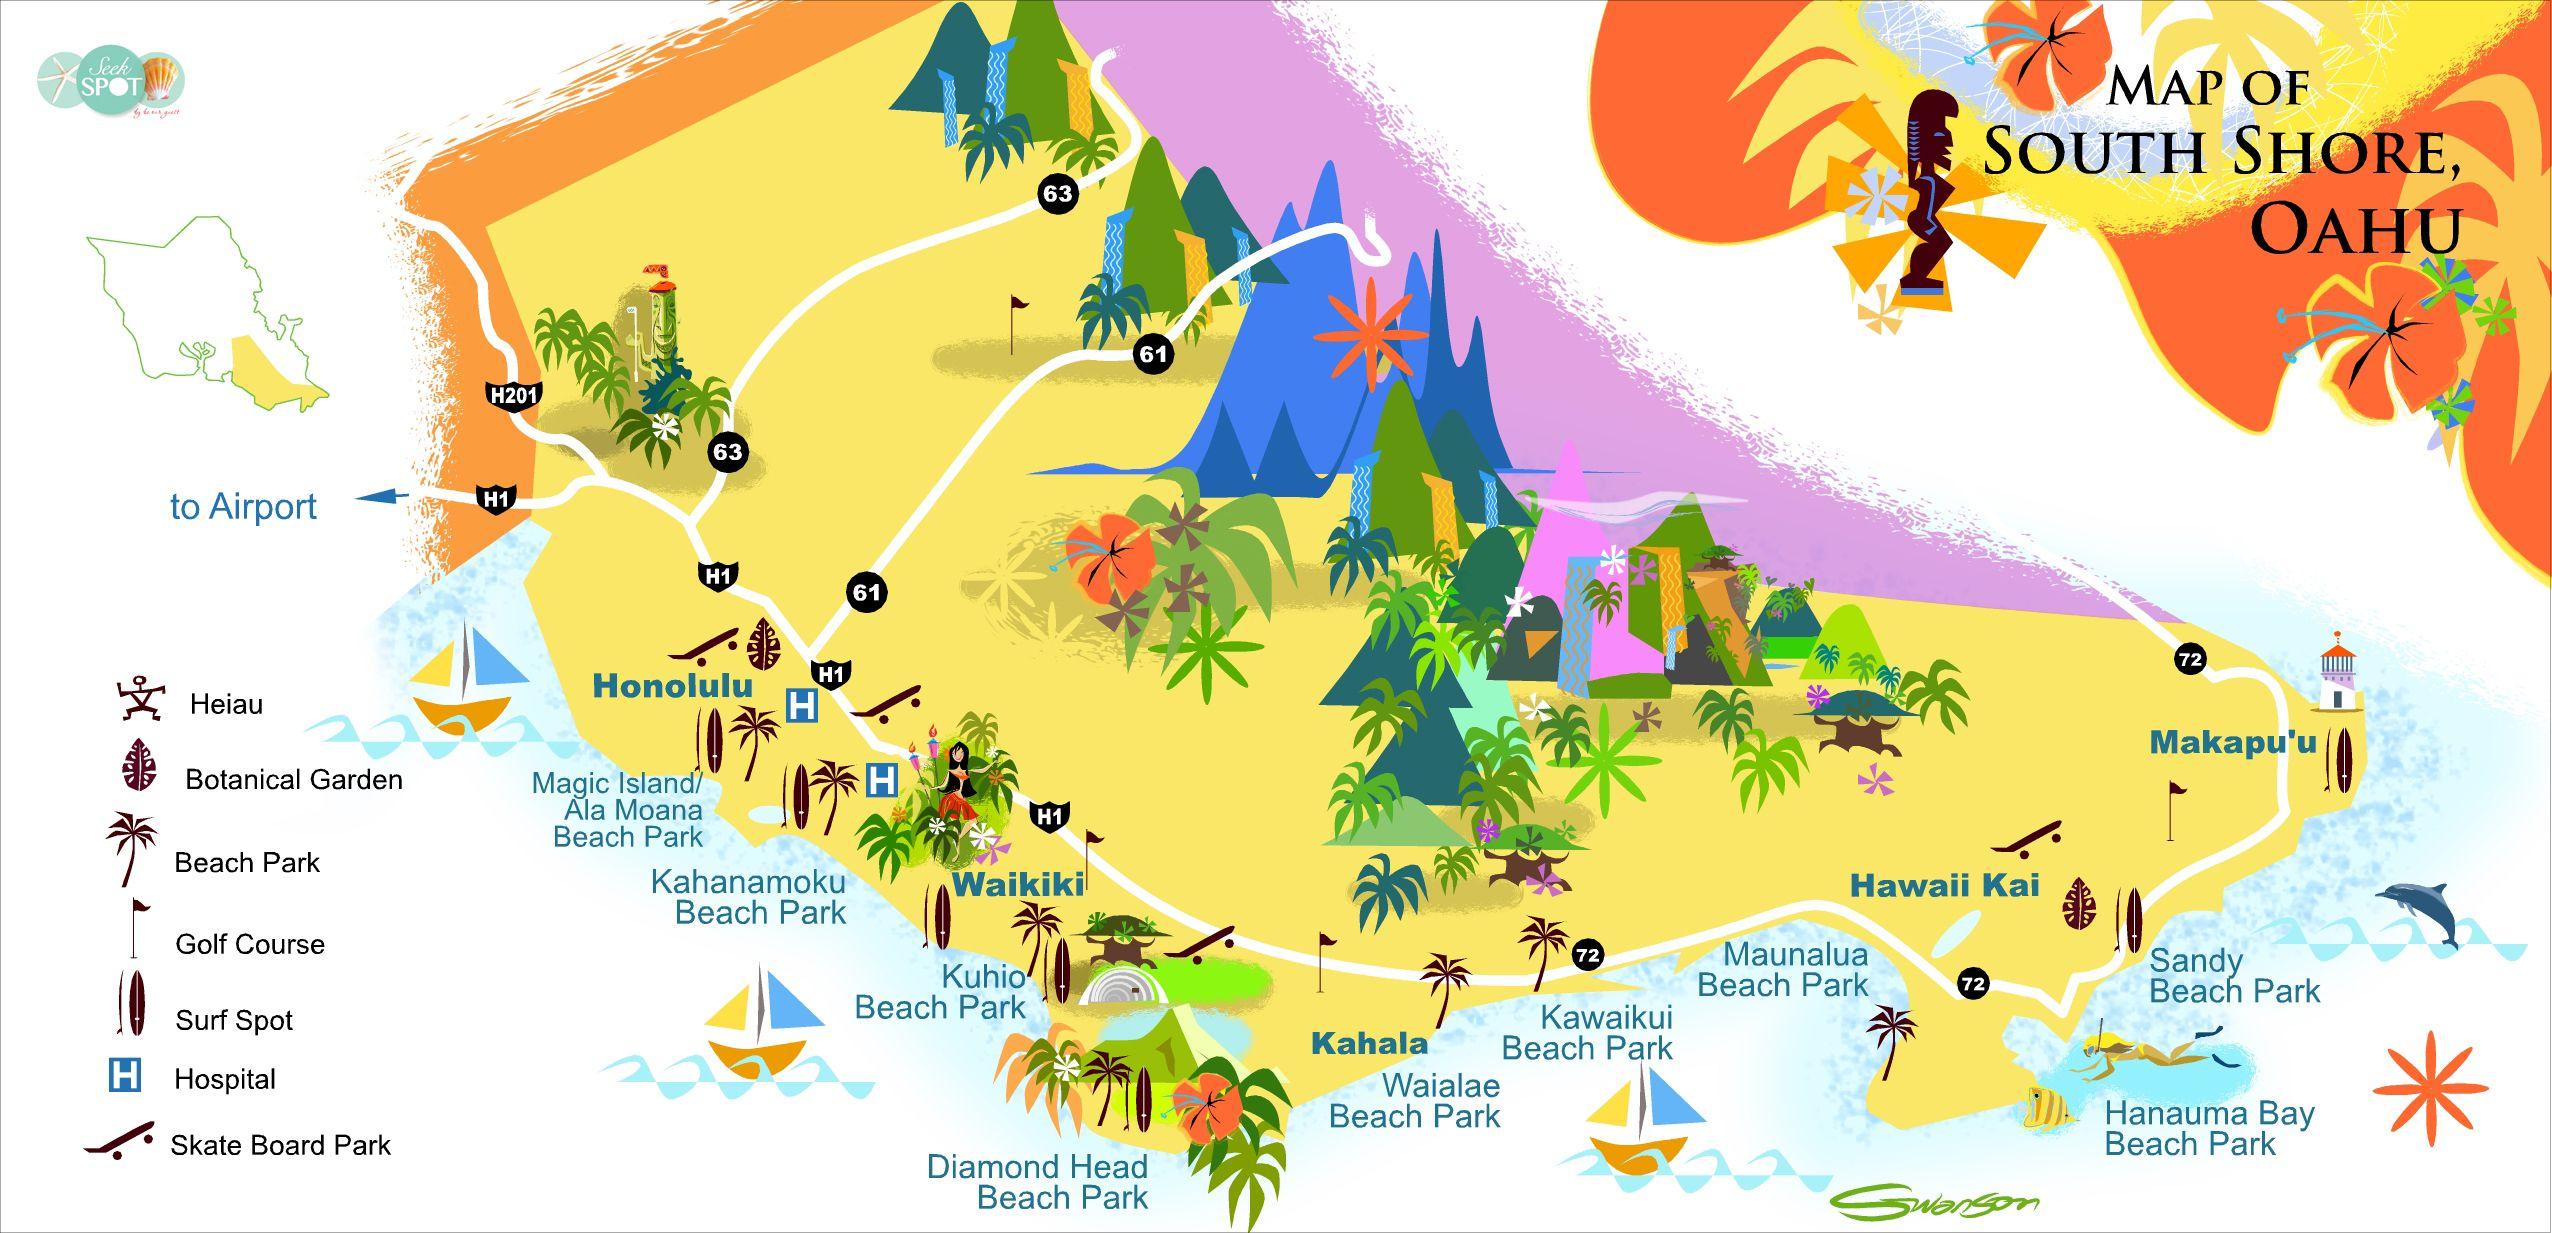 Oahu Maps Map Of South Shore Oahu Oahu In 2019 Oahu